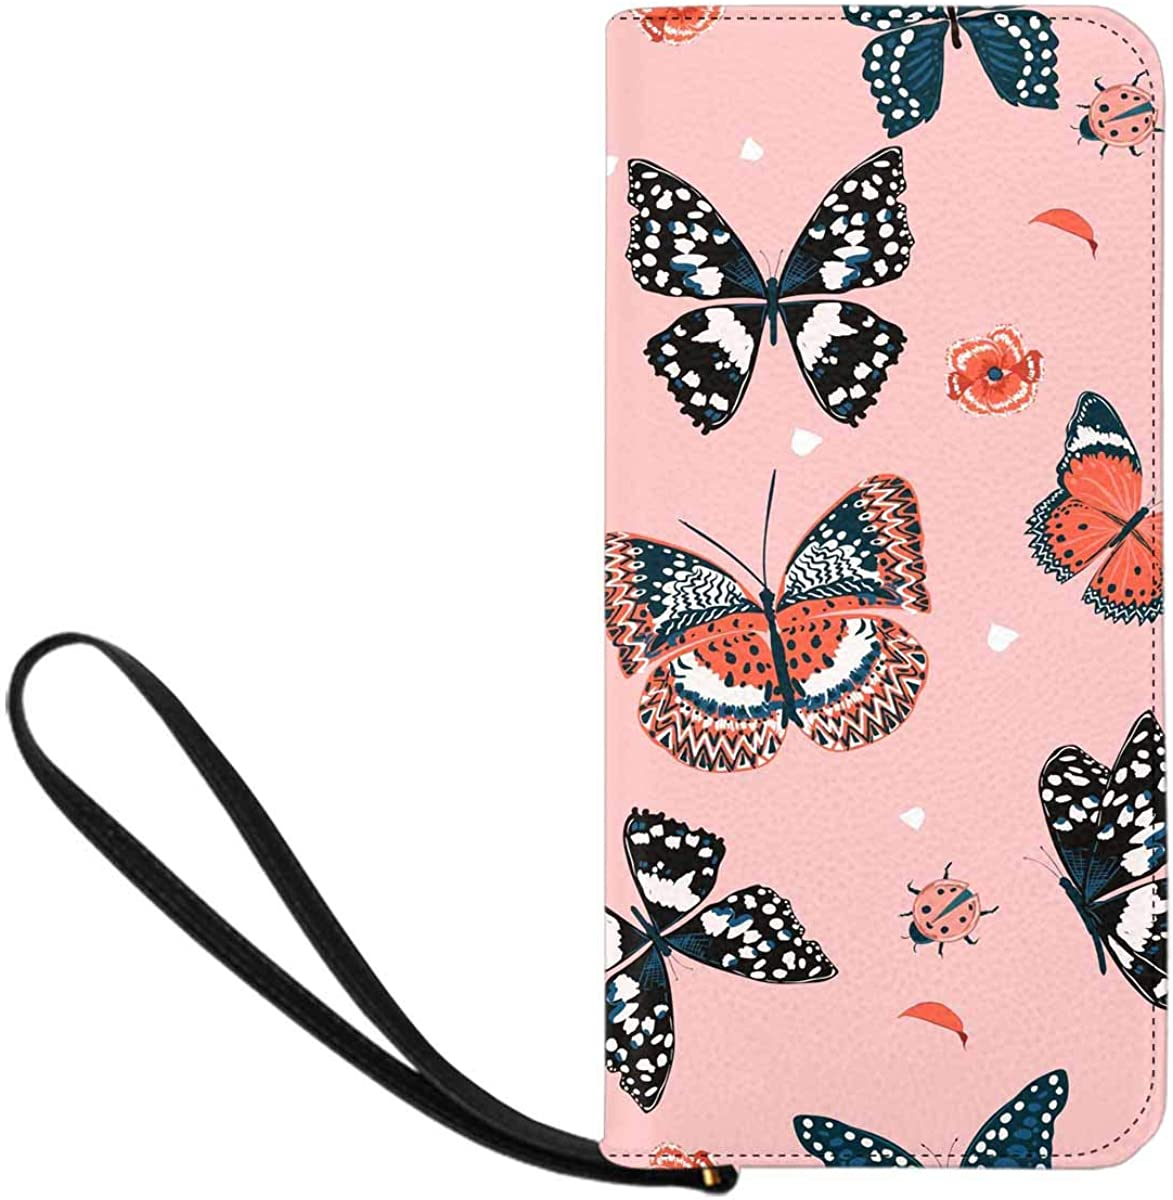 INTERESTPRINT Butterflies Flying in the Garden Wristlet Clutch Large Travel Purse Wristlet